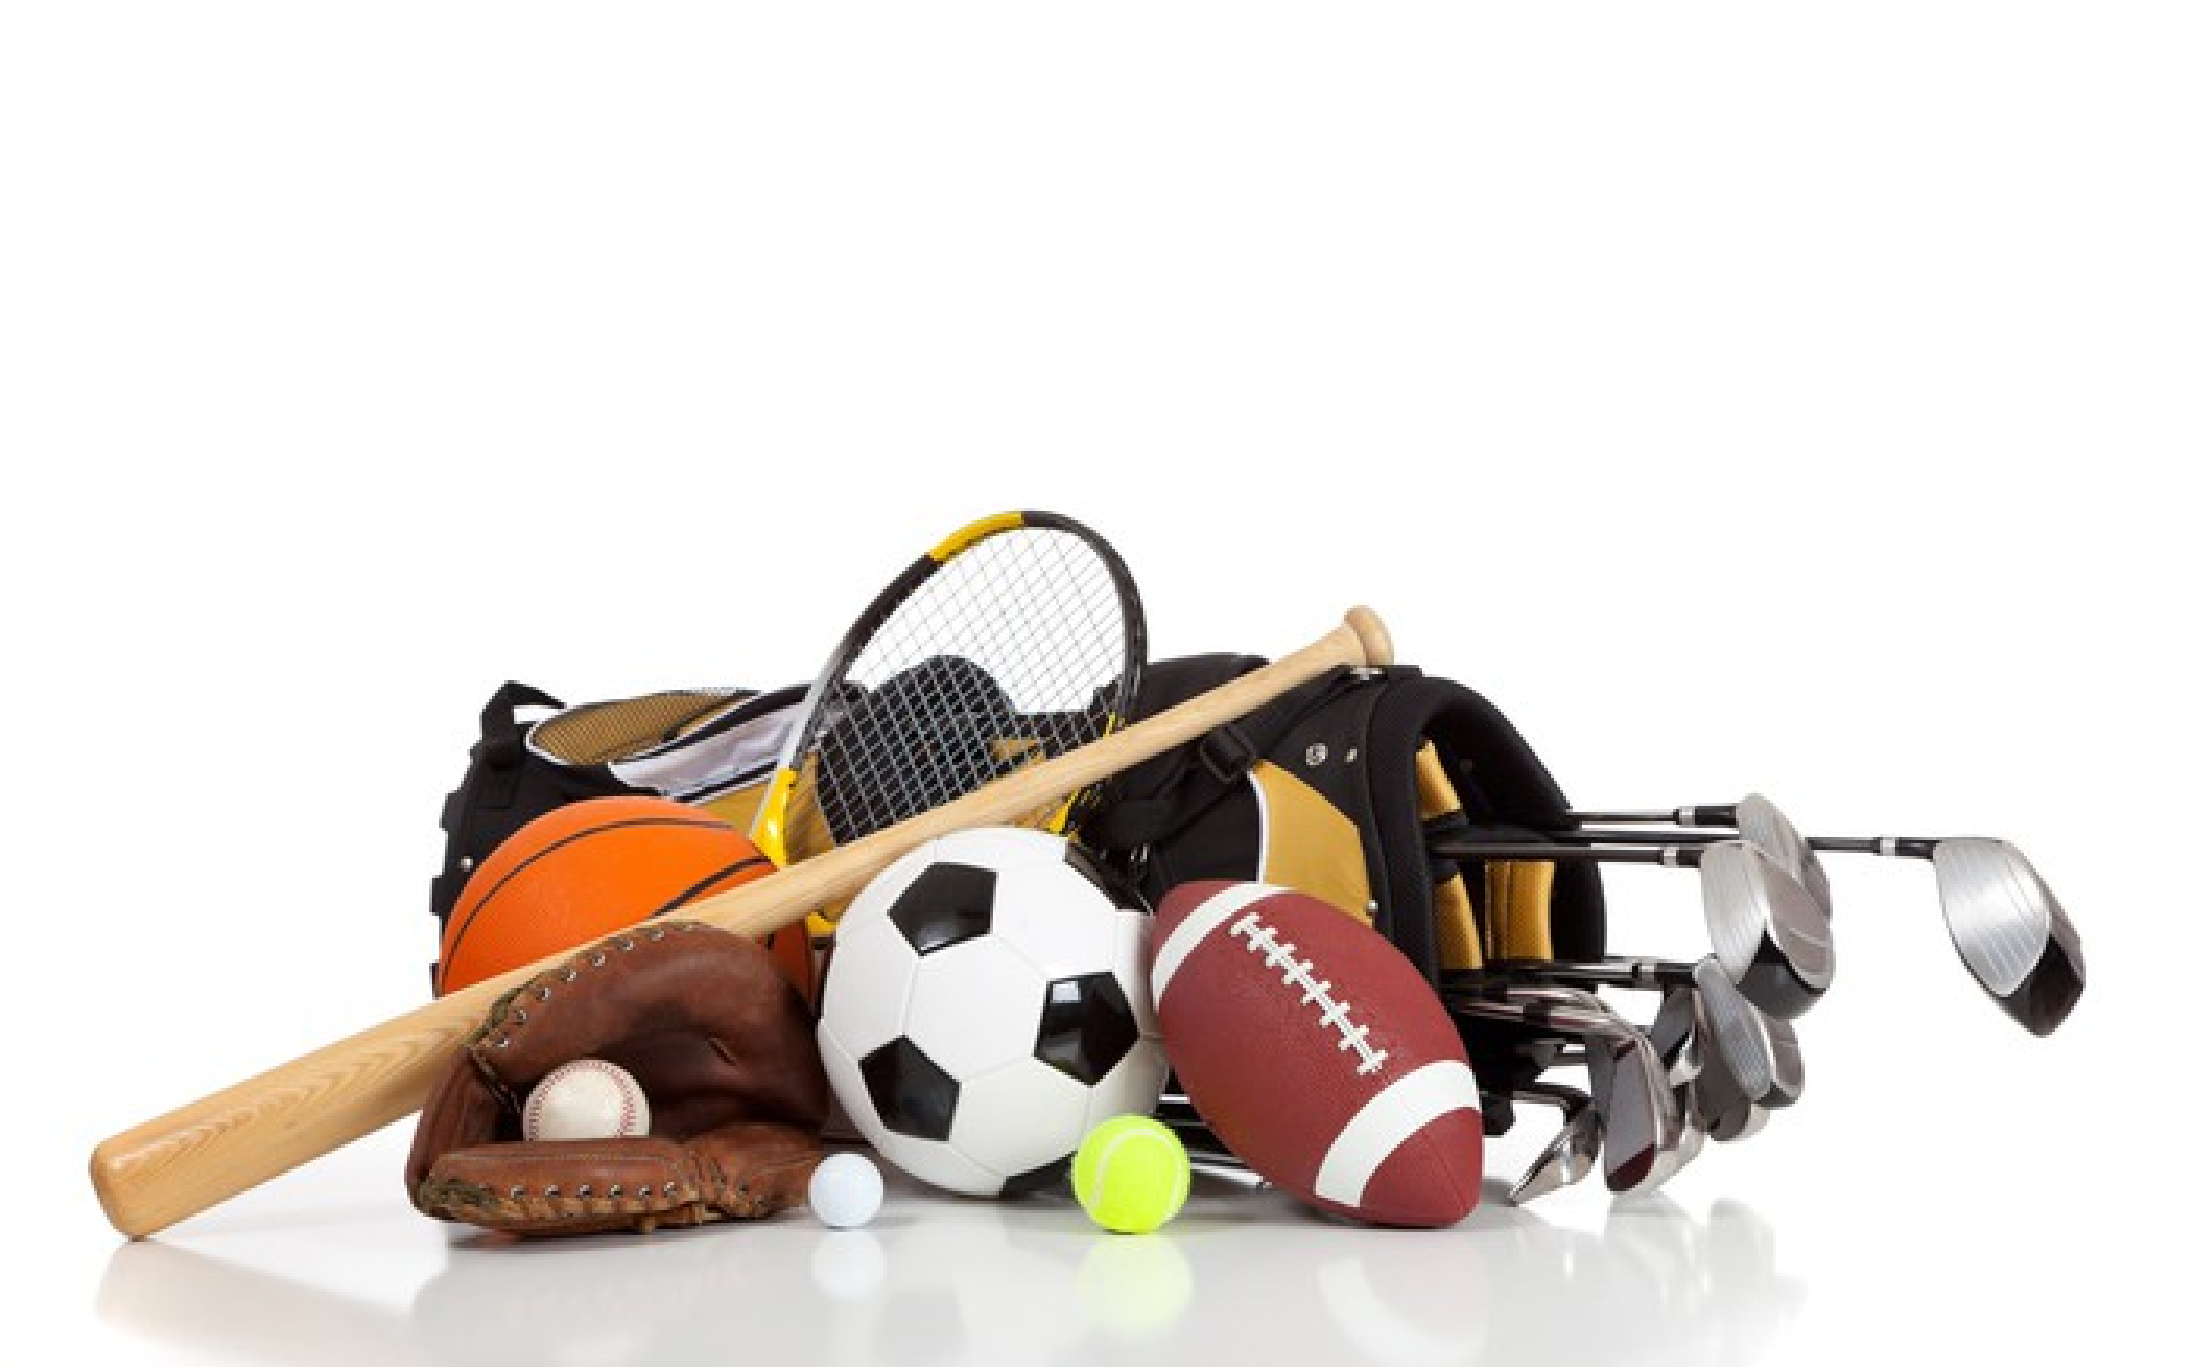 Pile of sporting goods equipment.